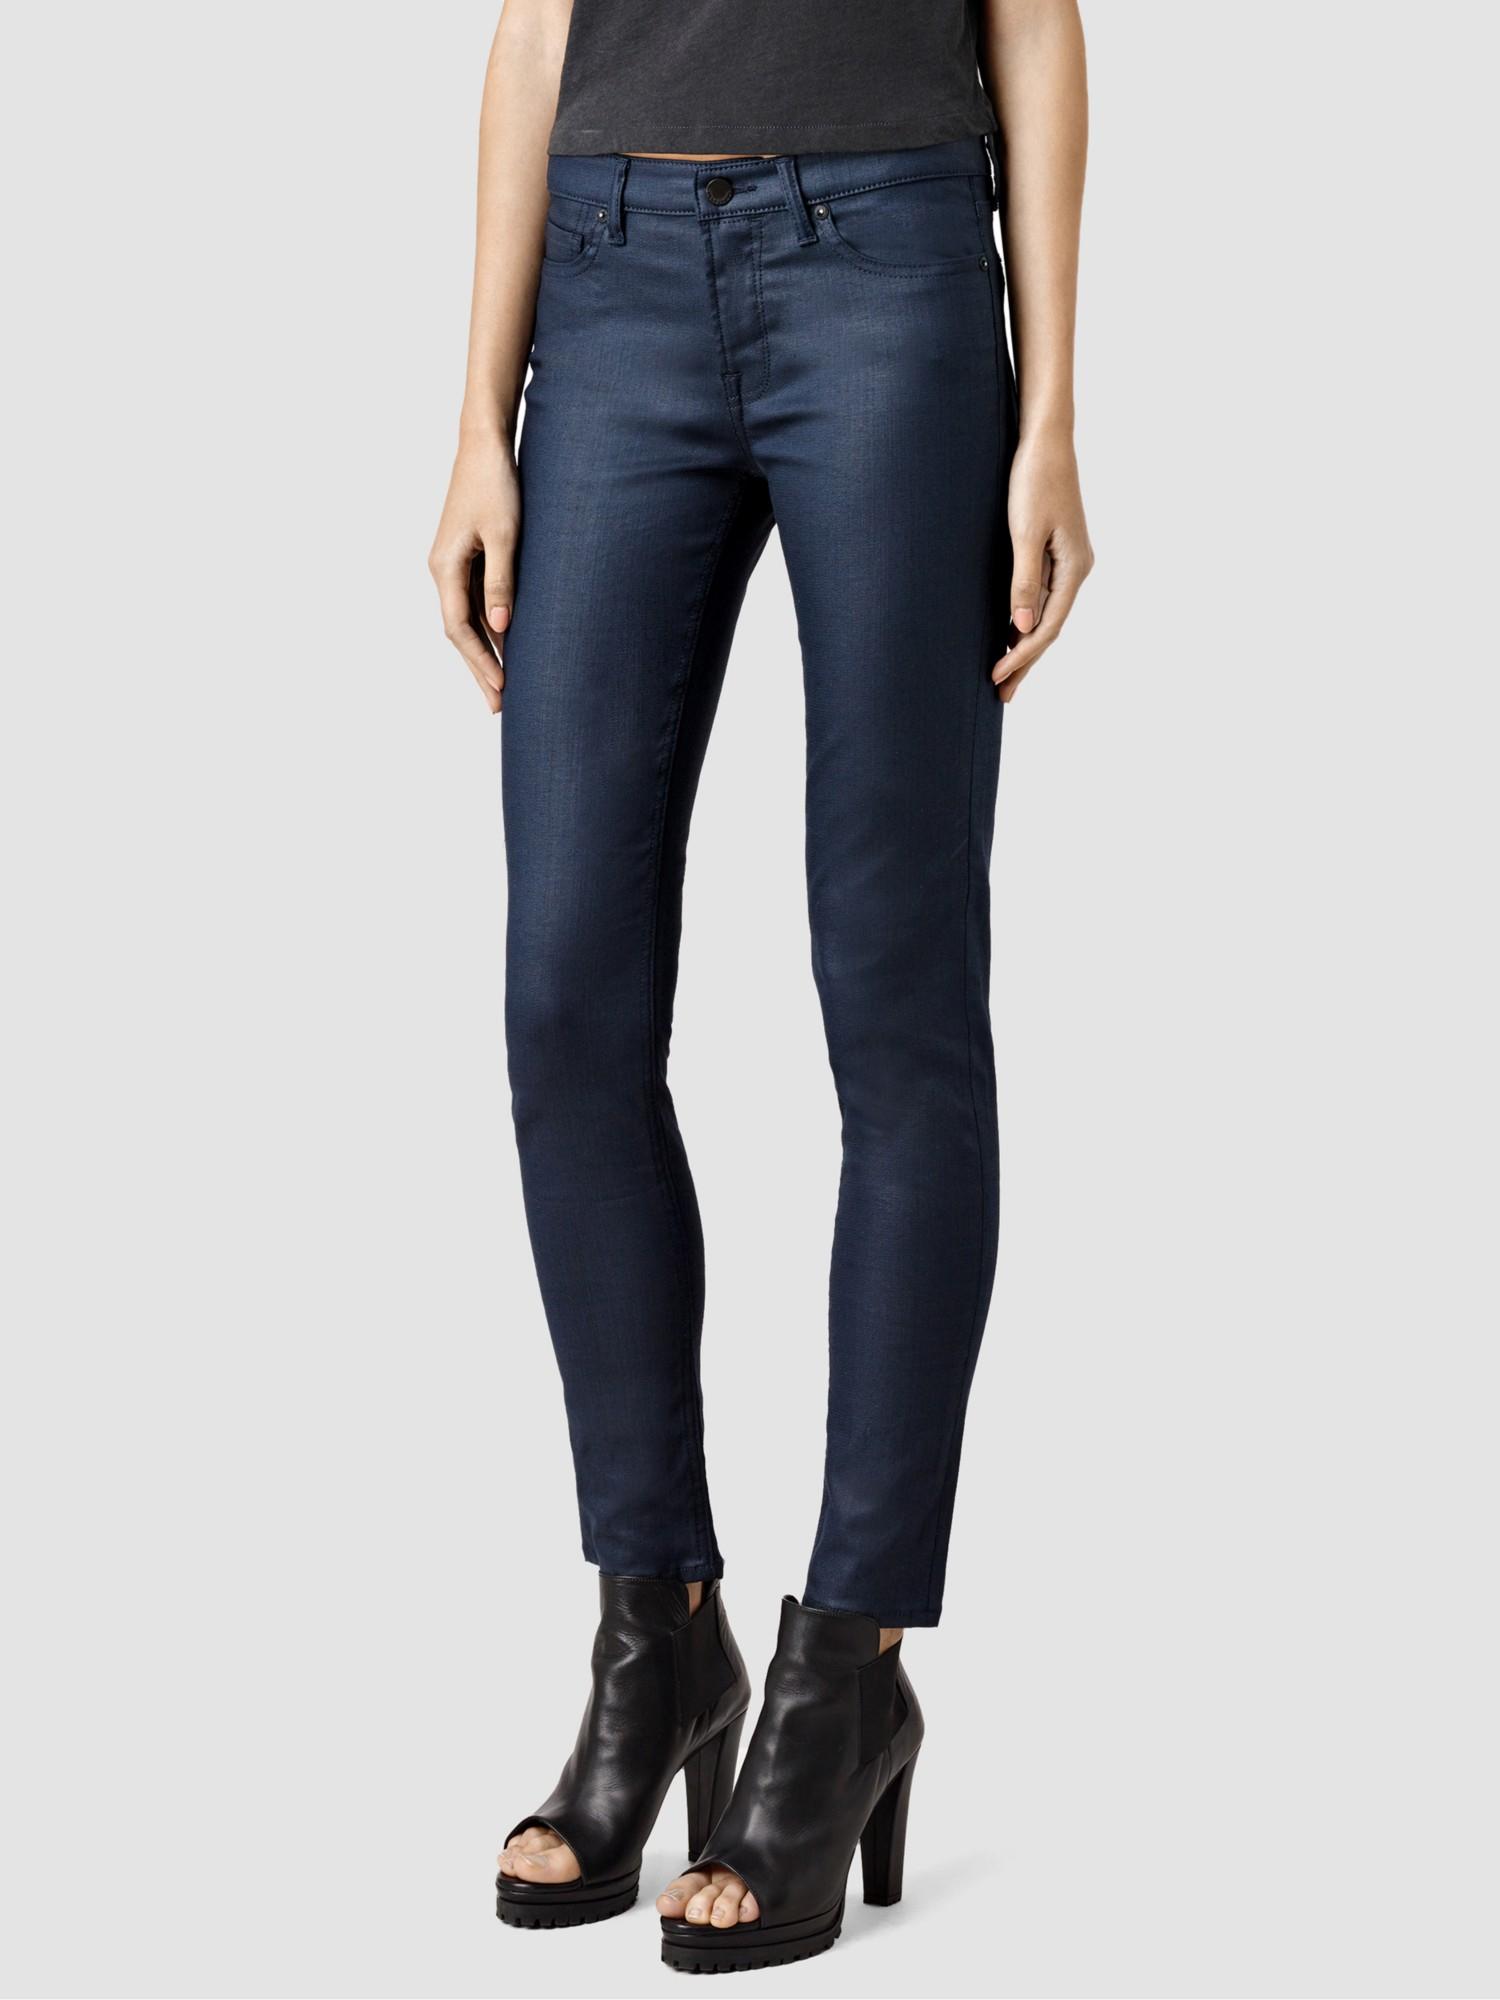 Navy coated skinny jeans